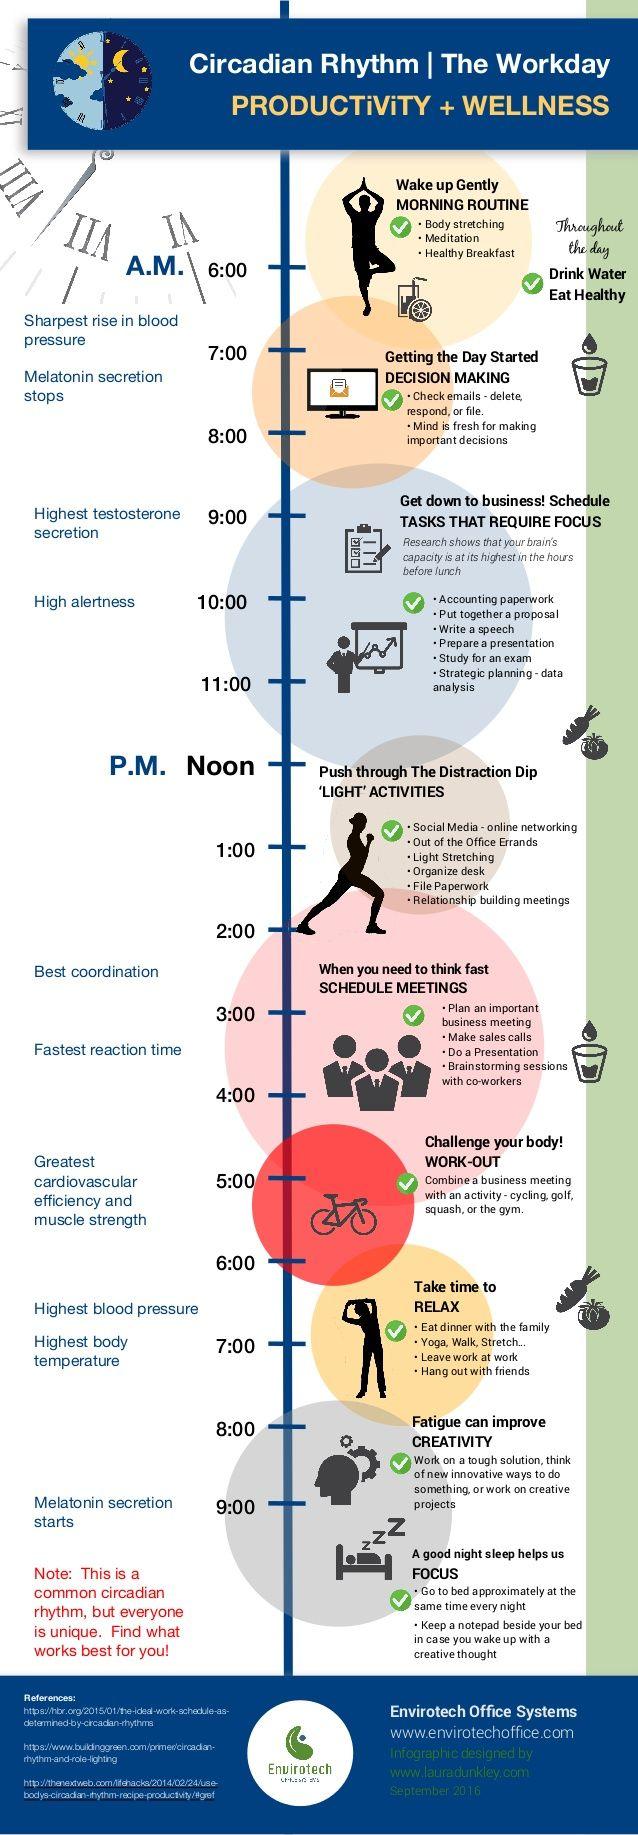 Forum on this topic: Is Melatonin the Answer for Better Sleep, is-melatonin-the-answer-for-better-sleep/